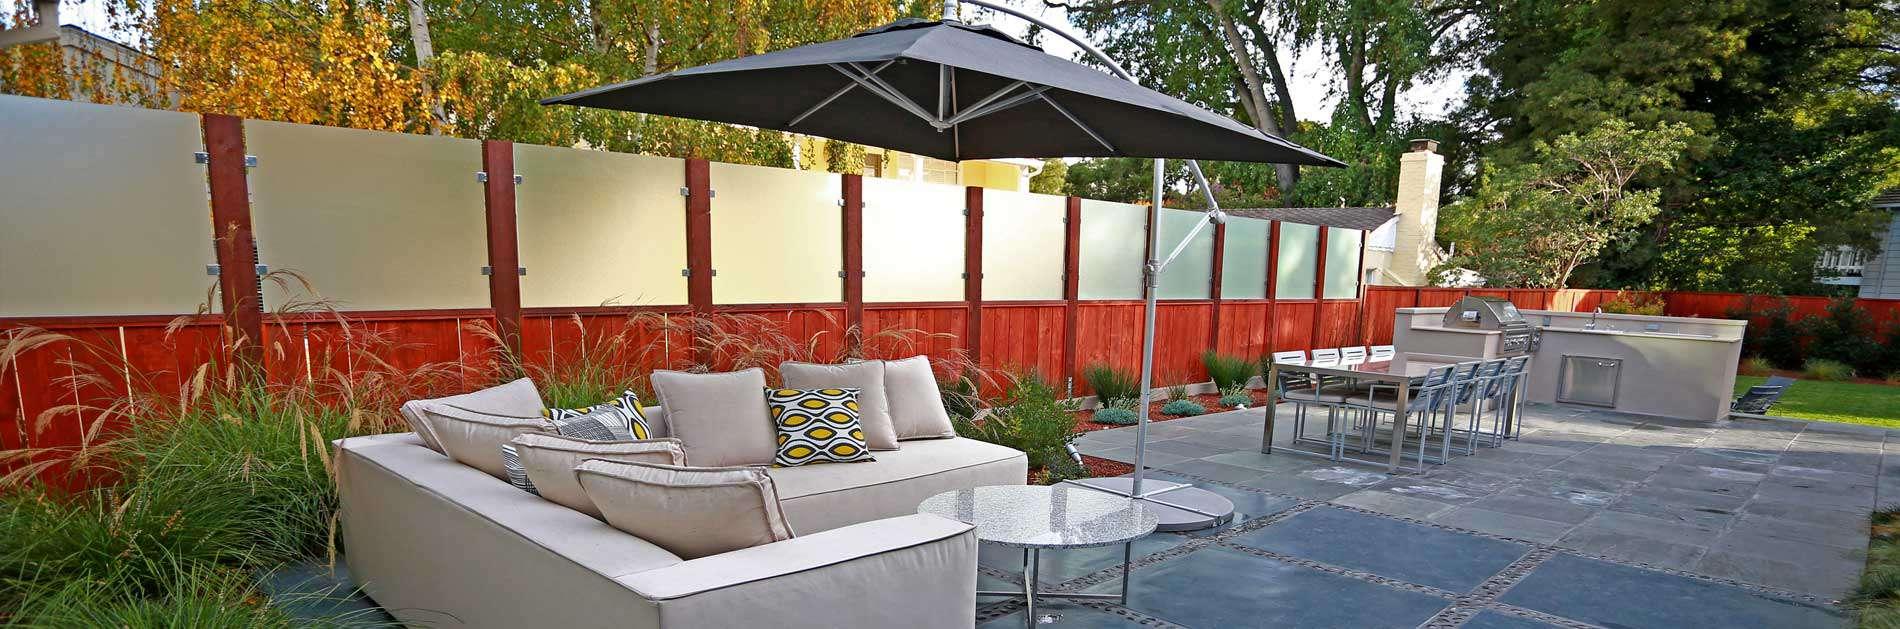 Backyard patio with seating and umbrella